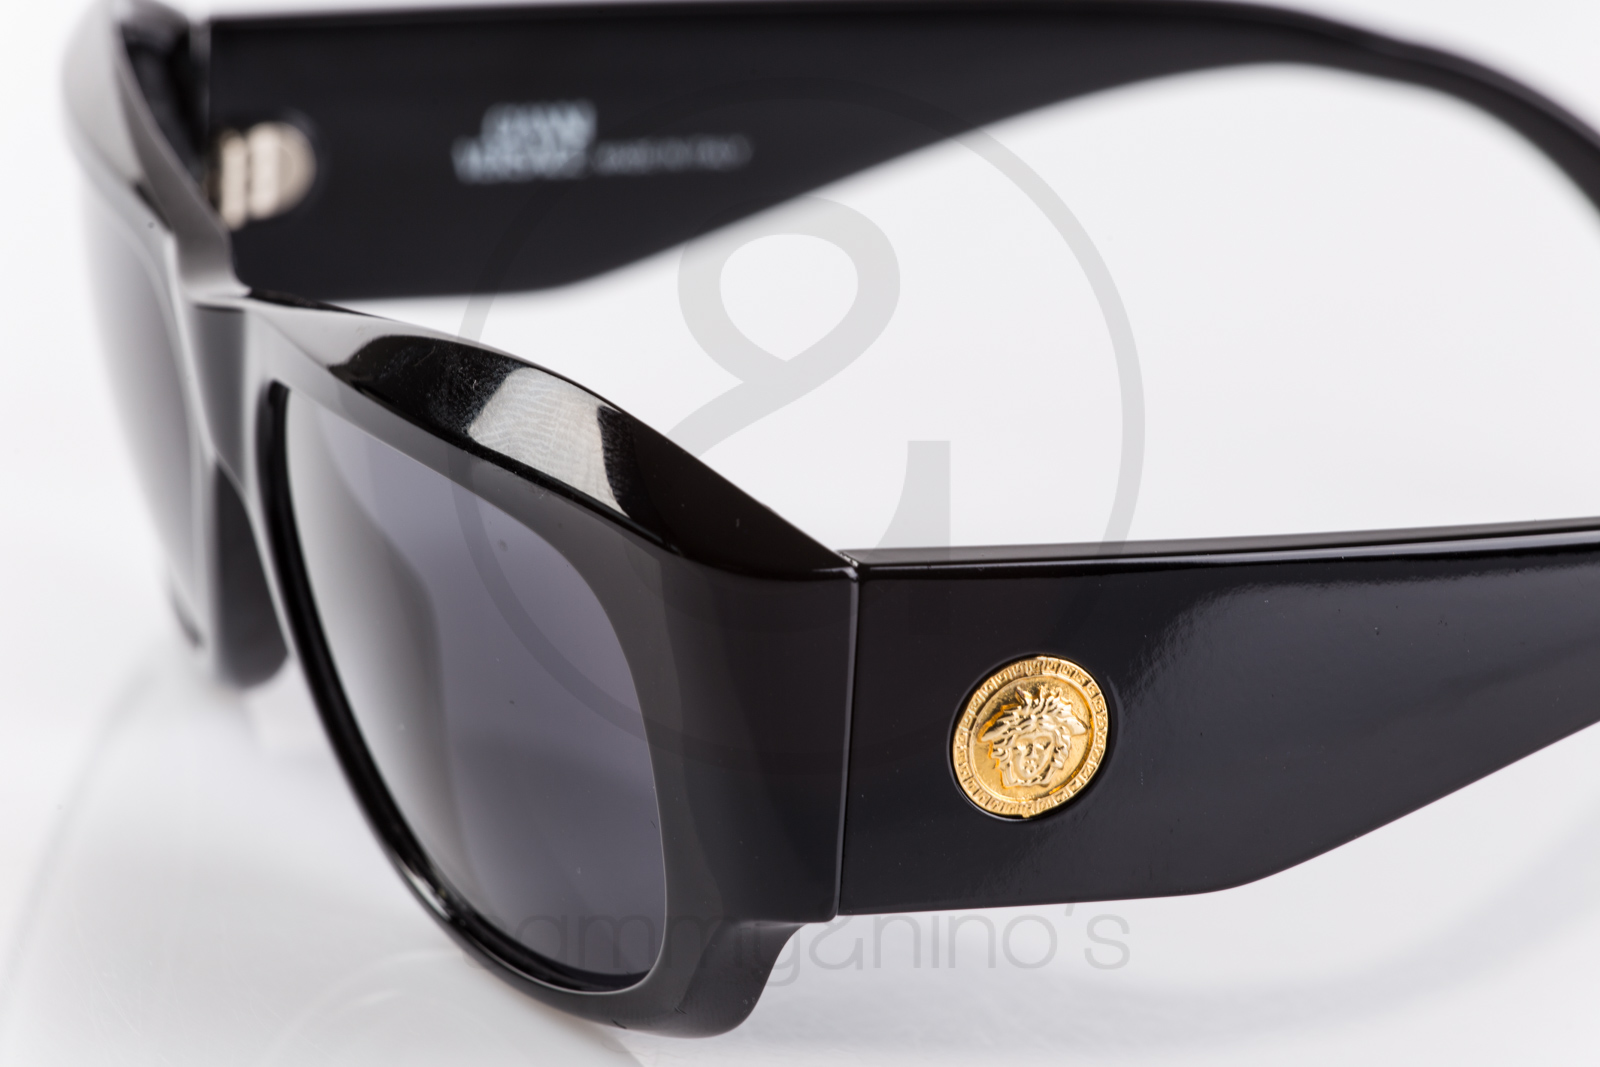 33c61c50a3161 Previous  Next. HomeSOLD OUTGianni Versace 375 852